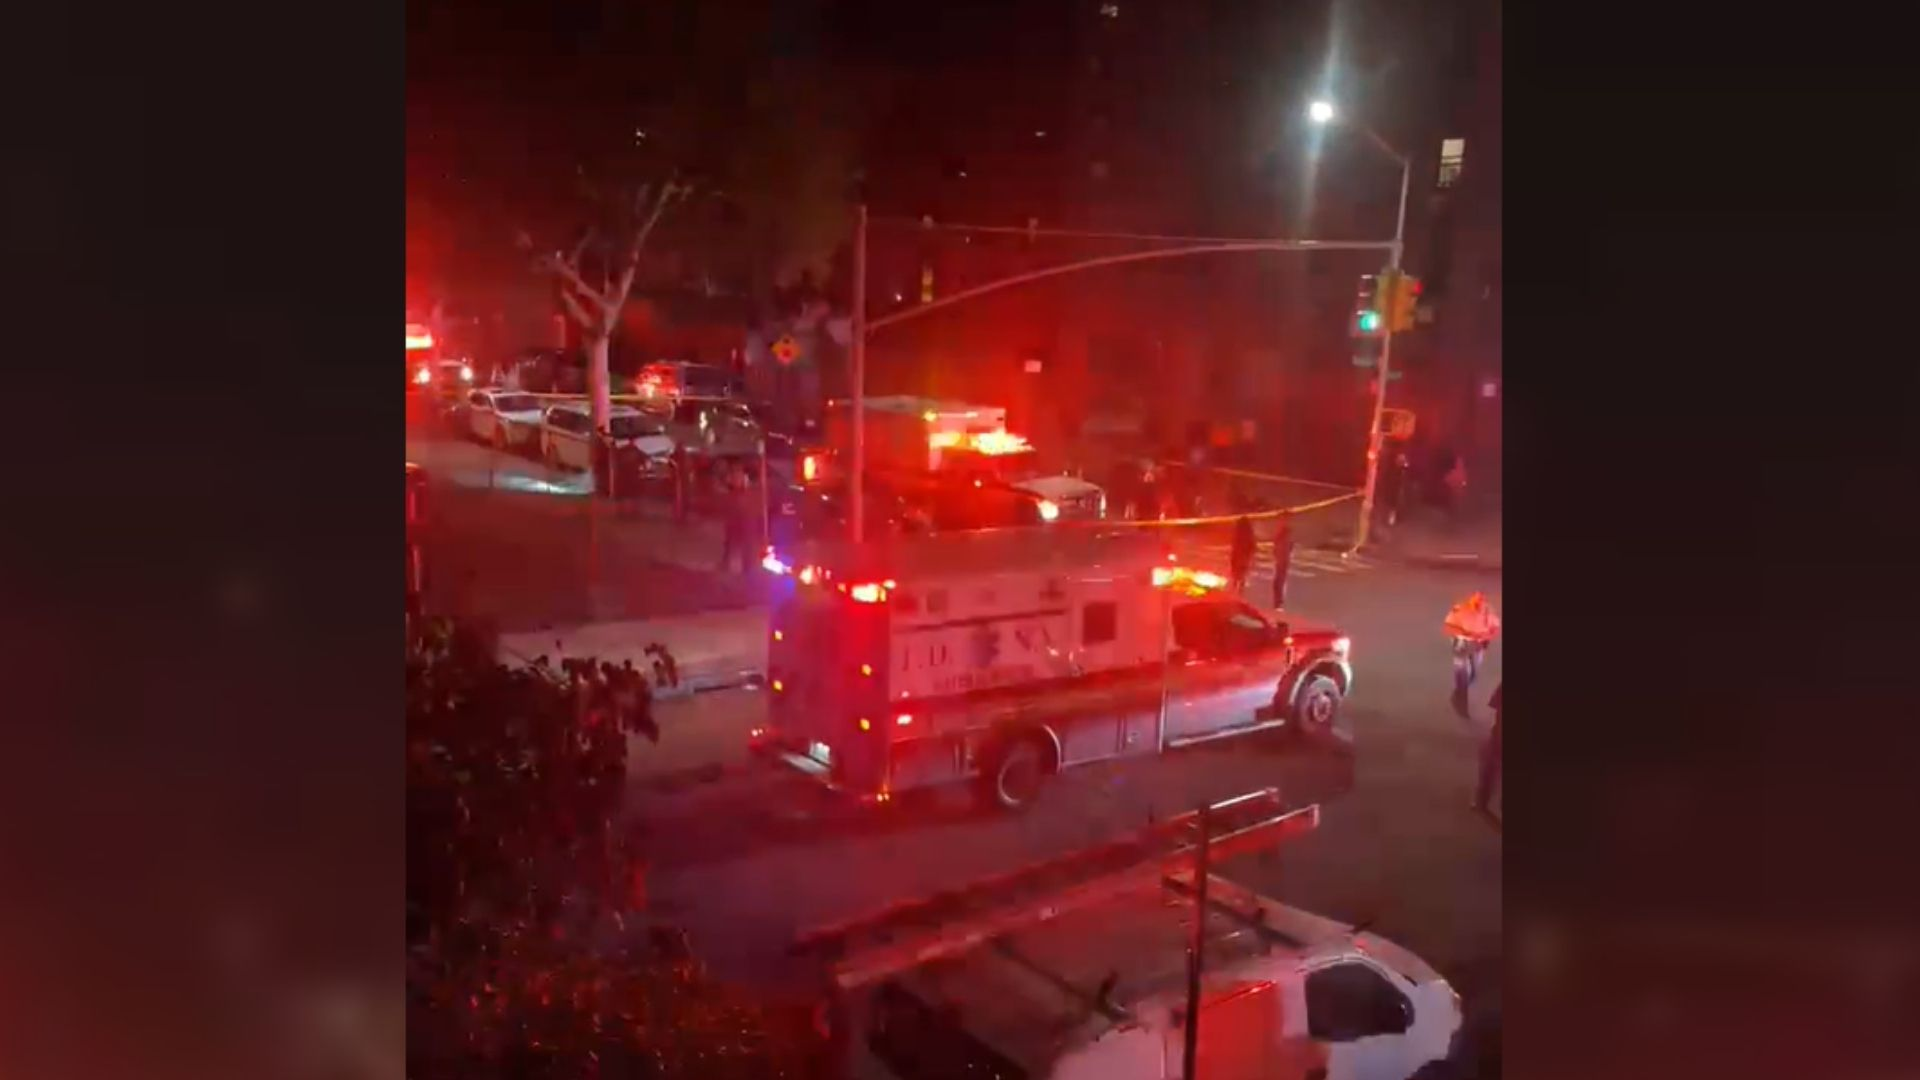 Brooklyn teen shot in Bed-Stuy